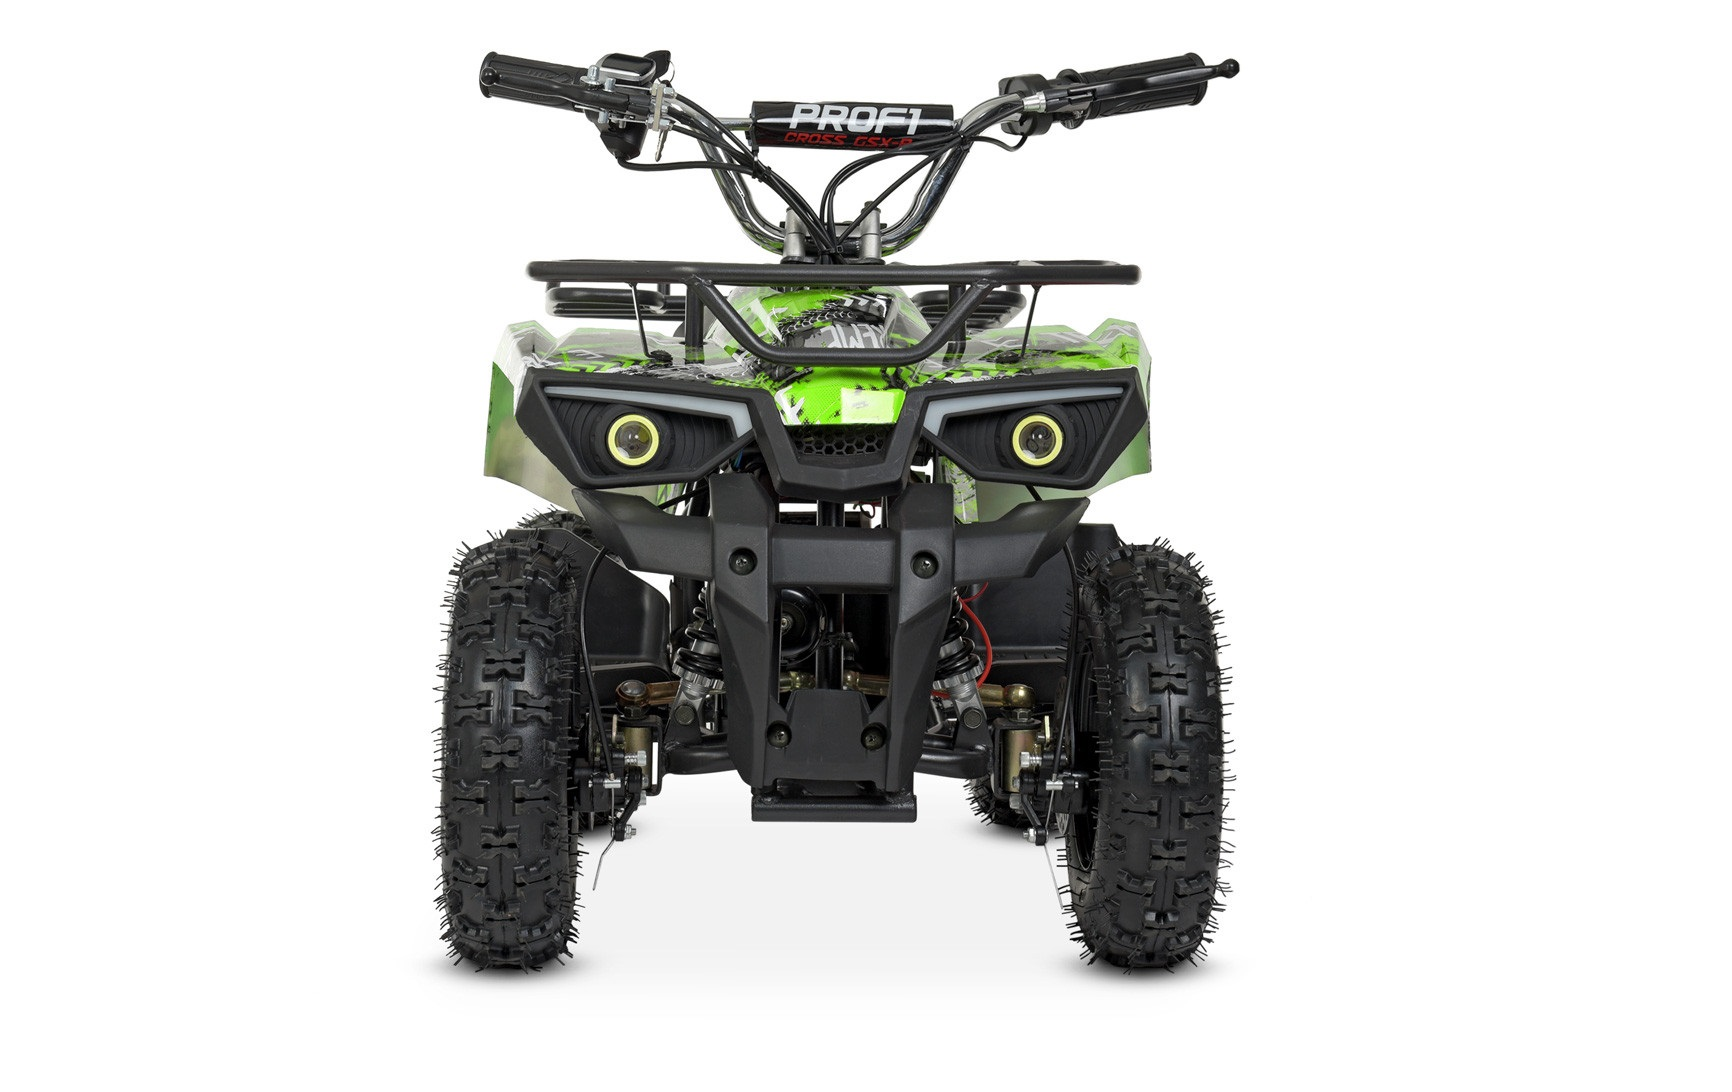 ЭЛЕКТРОКВАДРОЦИКЛ PROFI HB-EATV 800 AS  Артмото - купить квадроцикл в украине и харькове, мотоцикл, снегоход, скутер, мопед, электромобиль